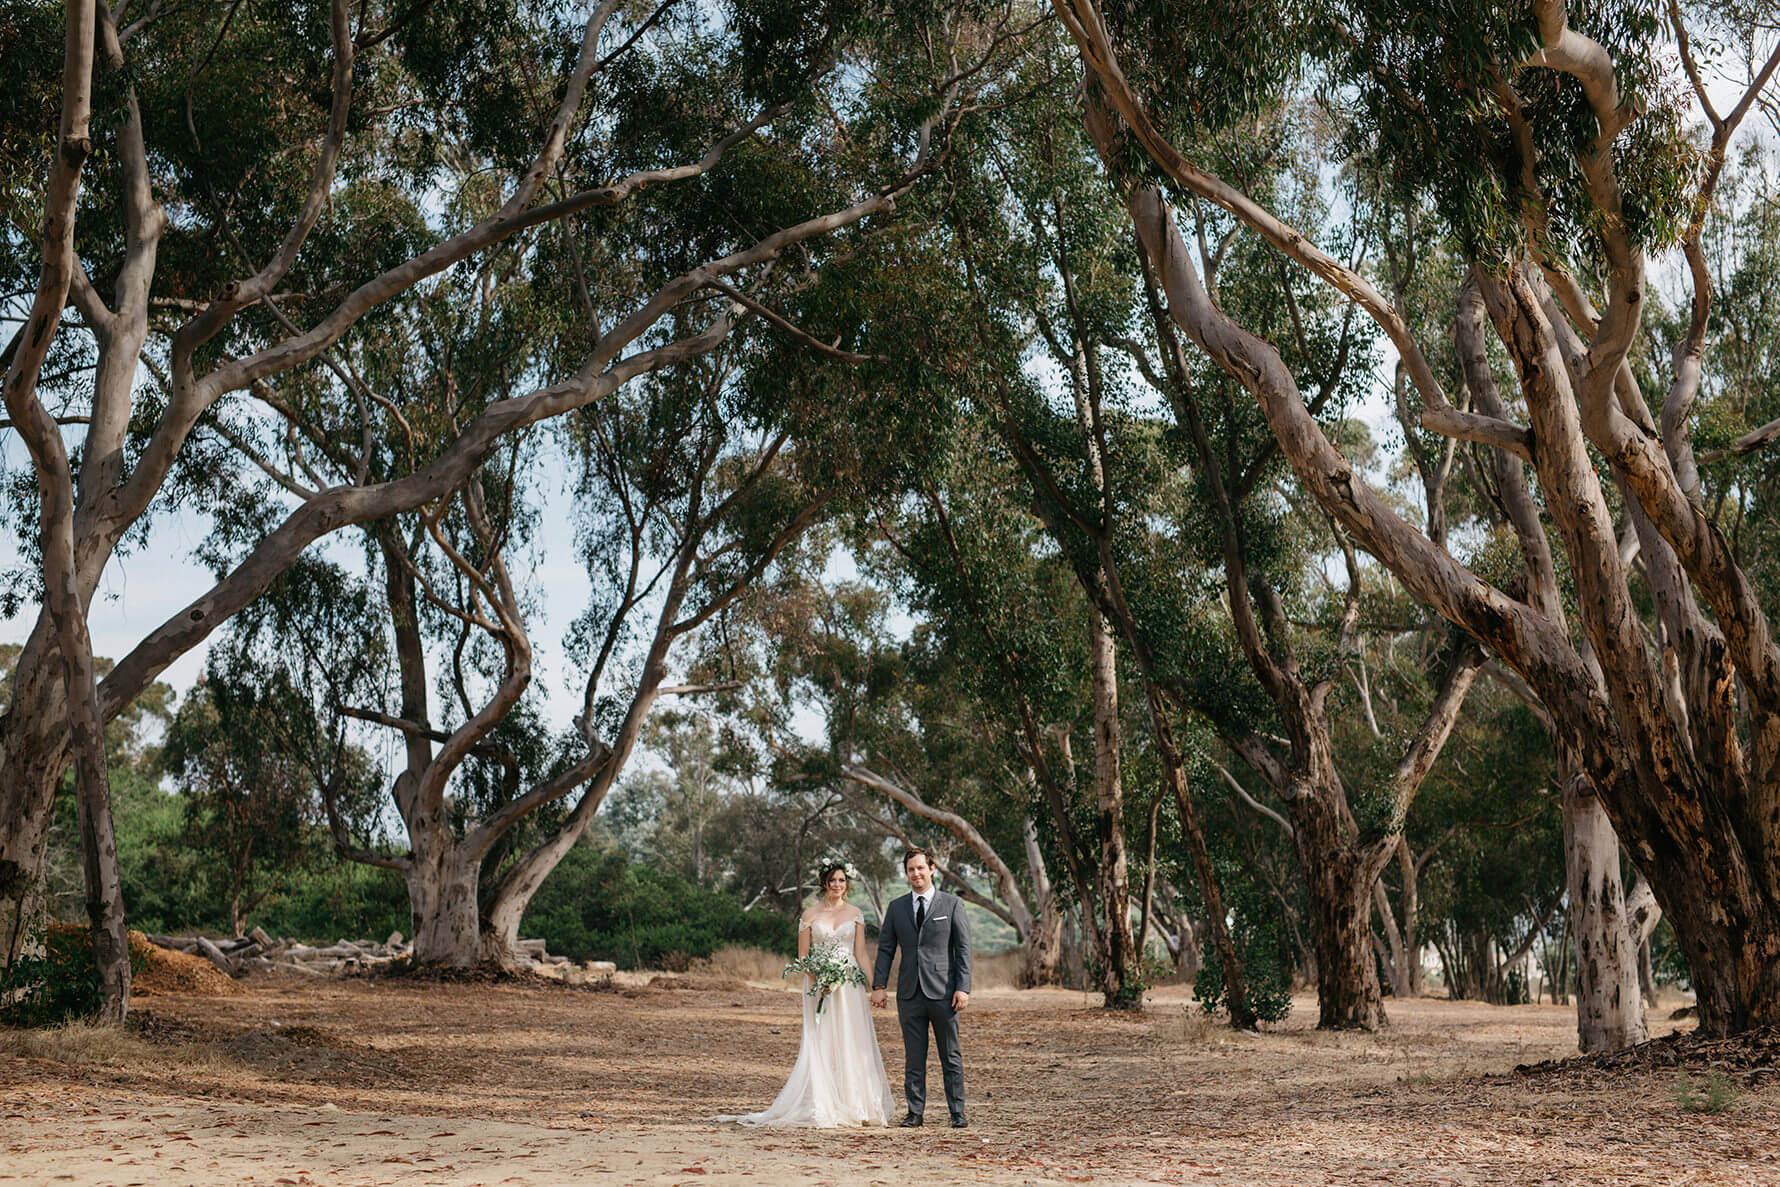 Timeless Romance San Diego Bride & Groom Portraits